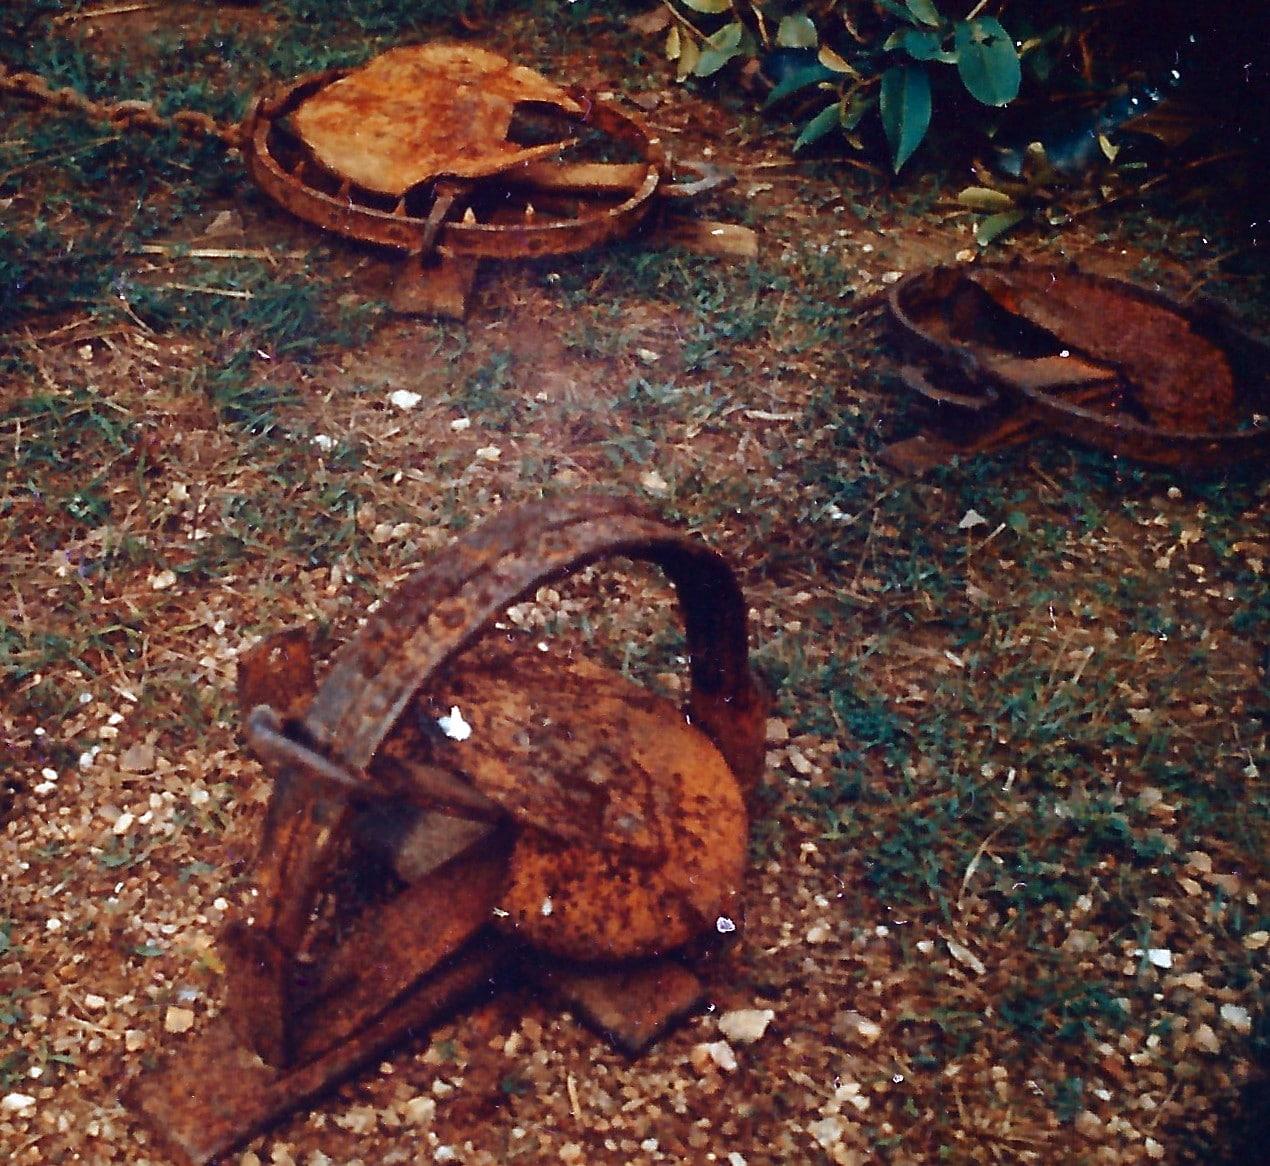 Bear traps found in Vietnam by the USMC